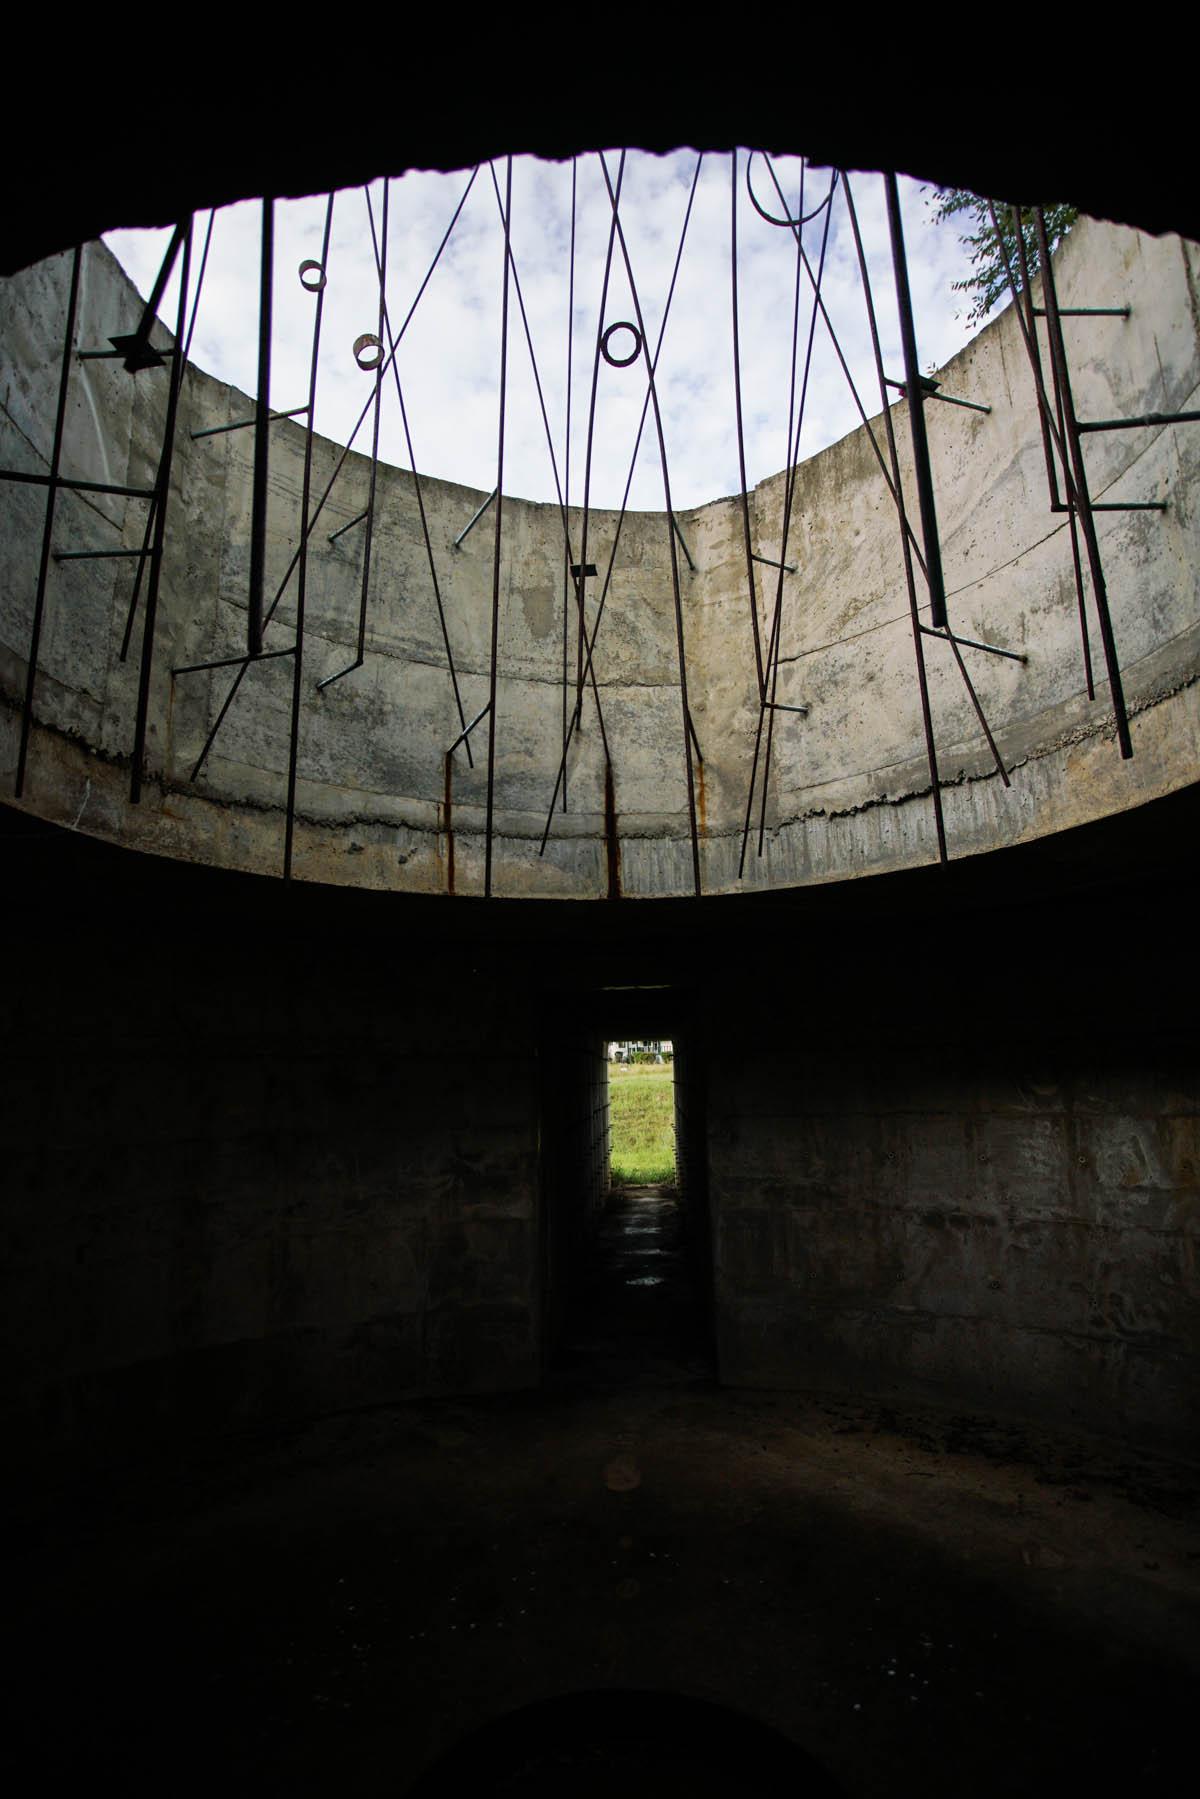 RA_rural studio_sub rosa chapel-07120.jpg